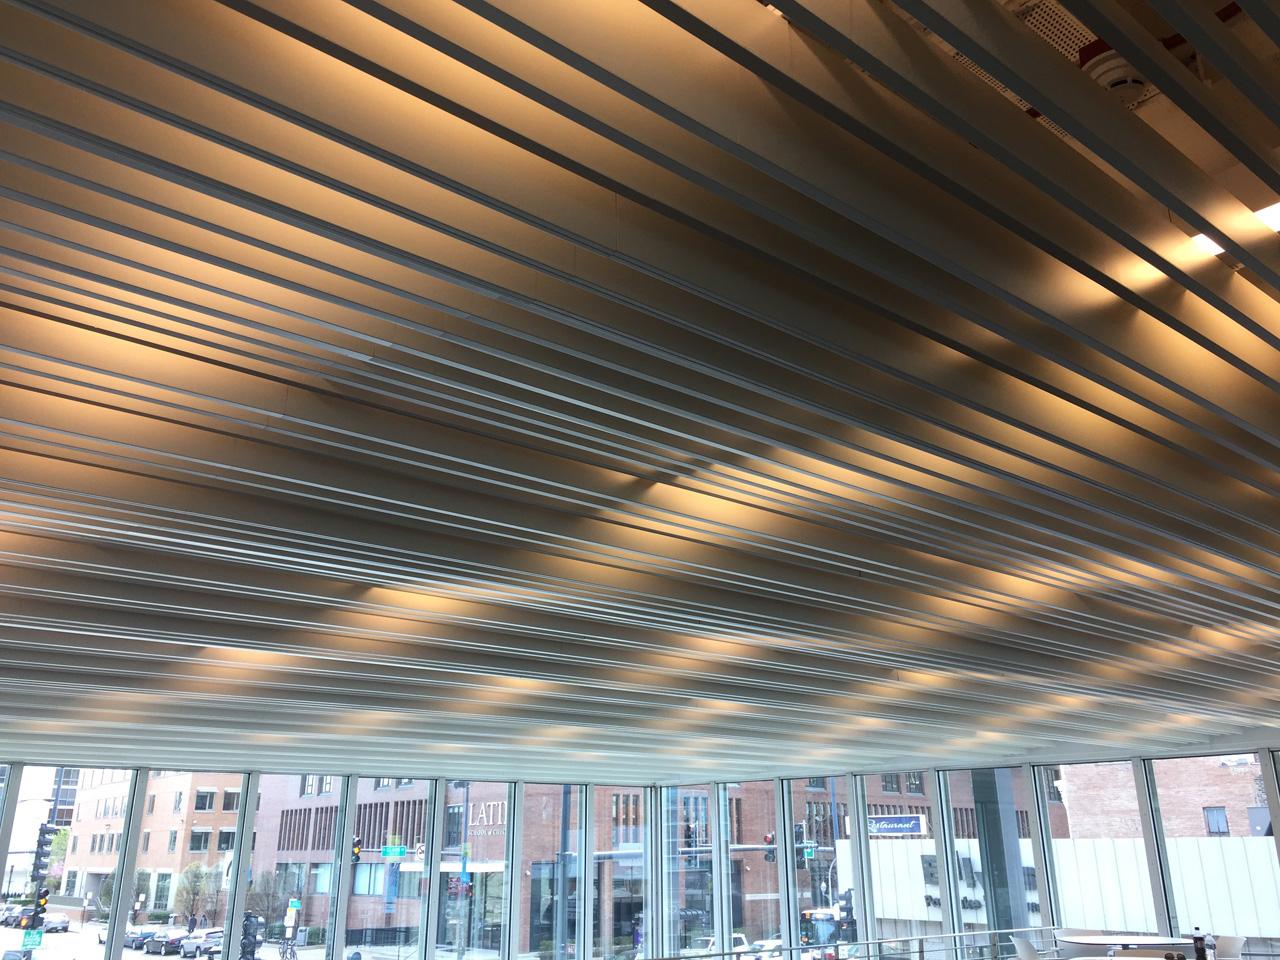 Ceiling system hides lighting